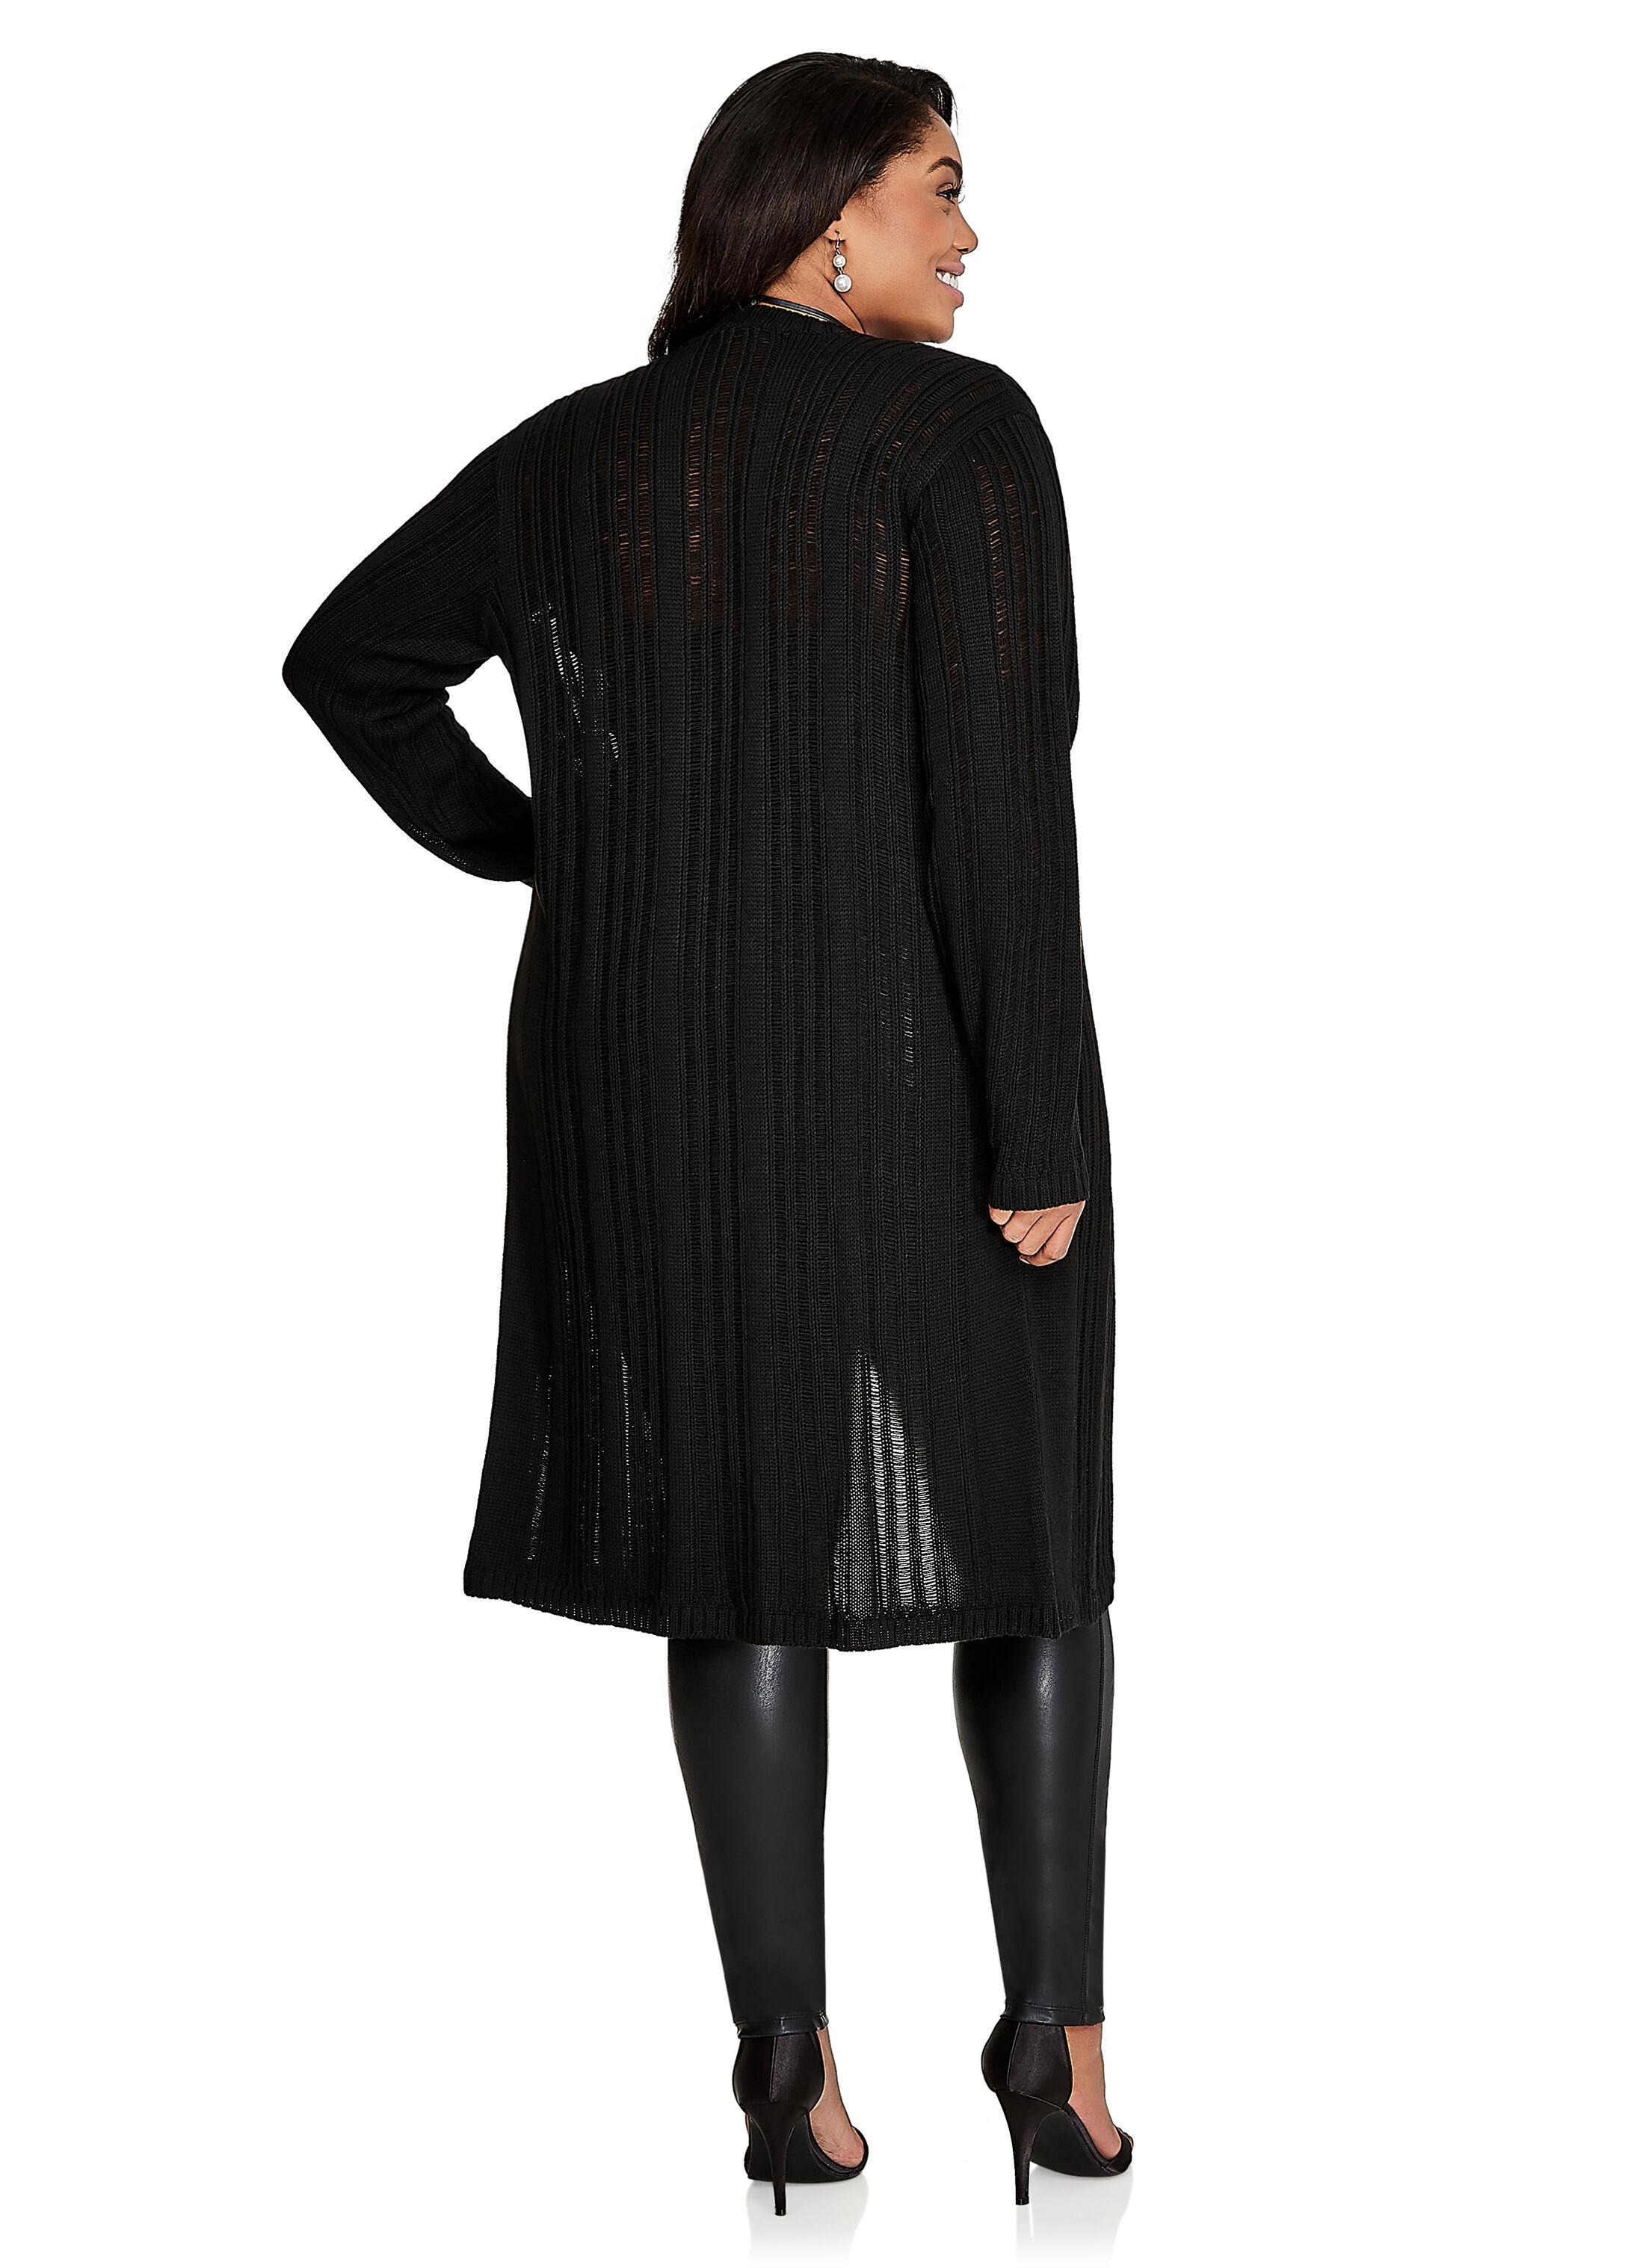 Plus Size Sweaters - Long Sleeve, Drop Needle Duster